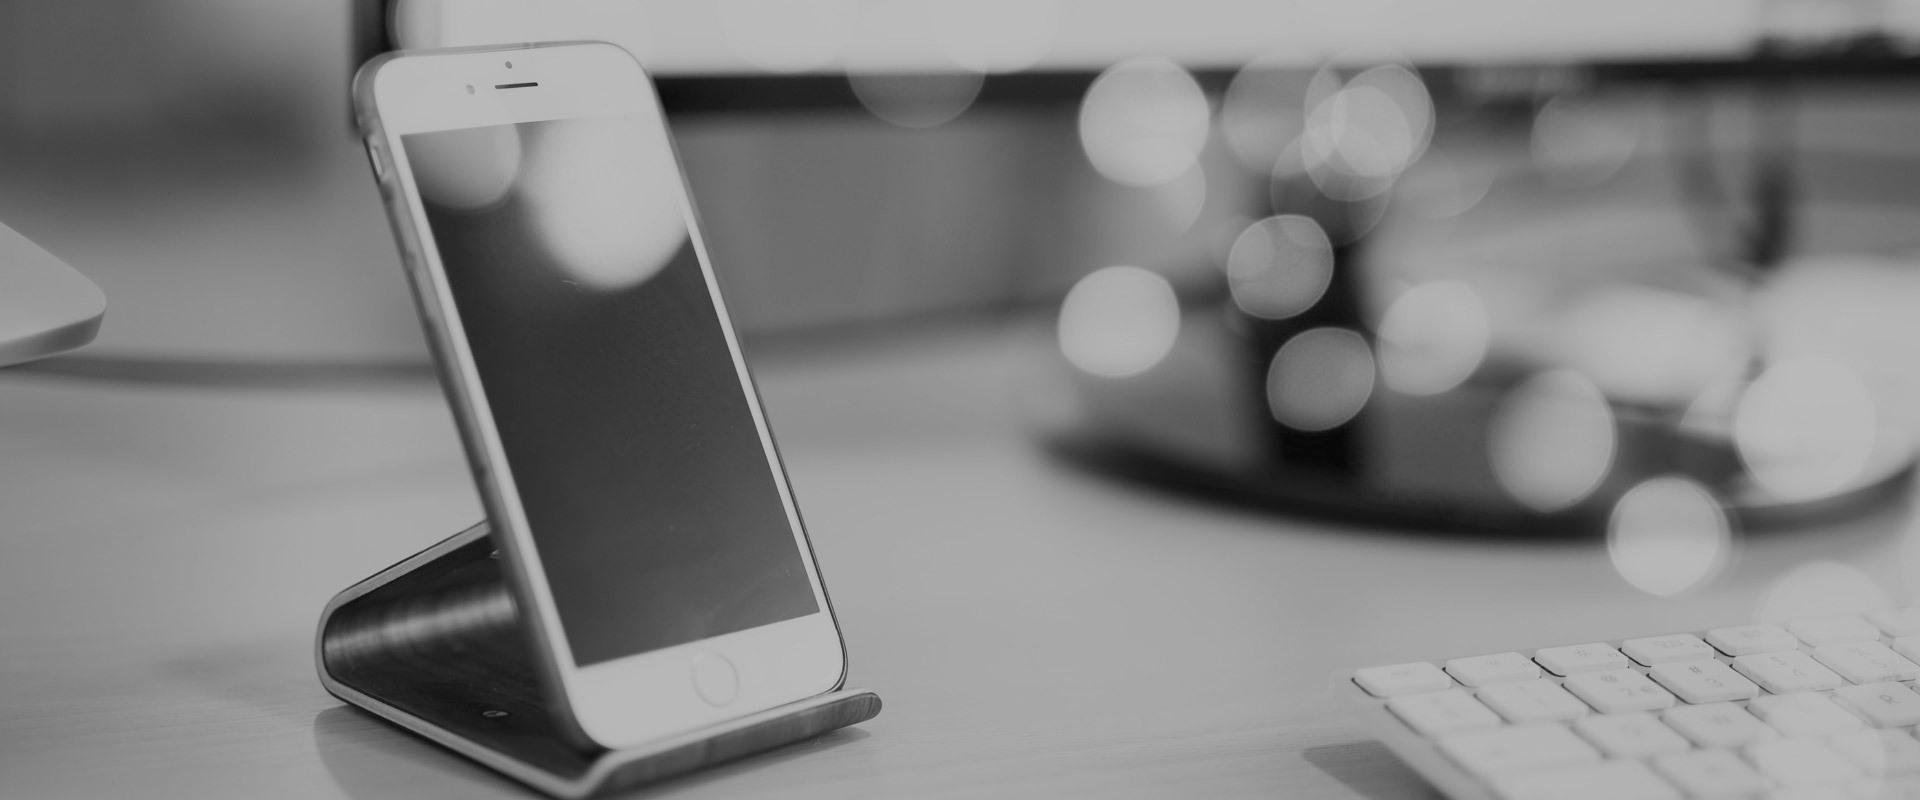 cshark_services_mobile-application-development_cover